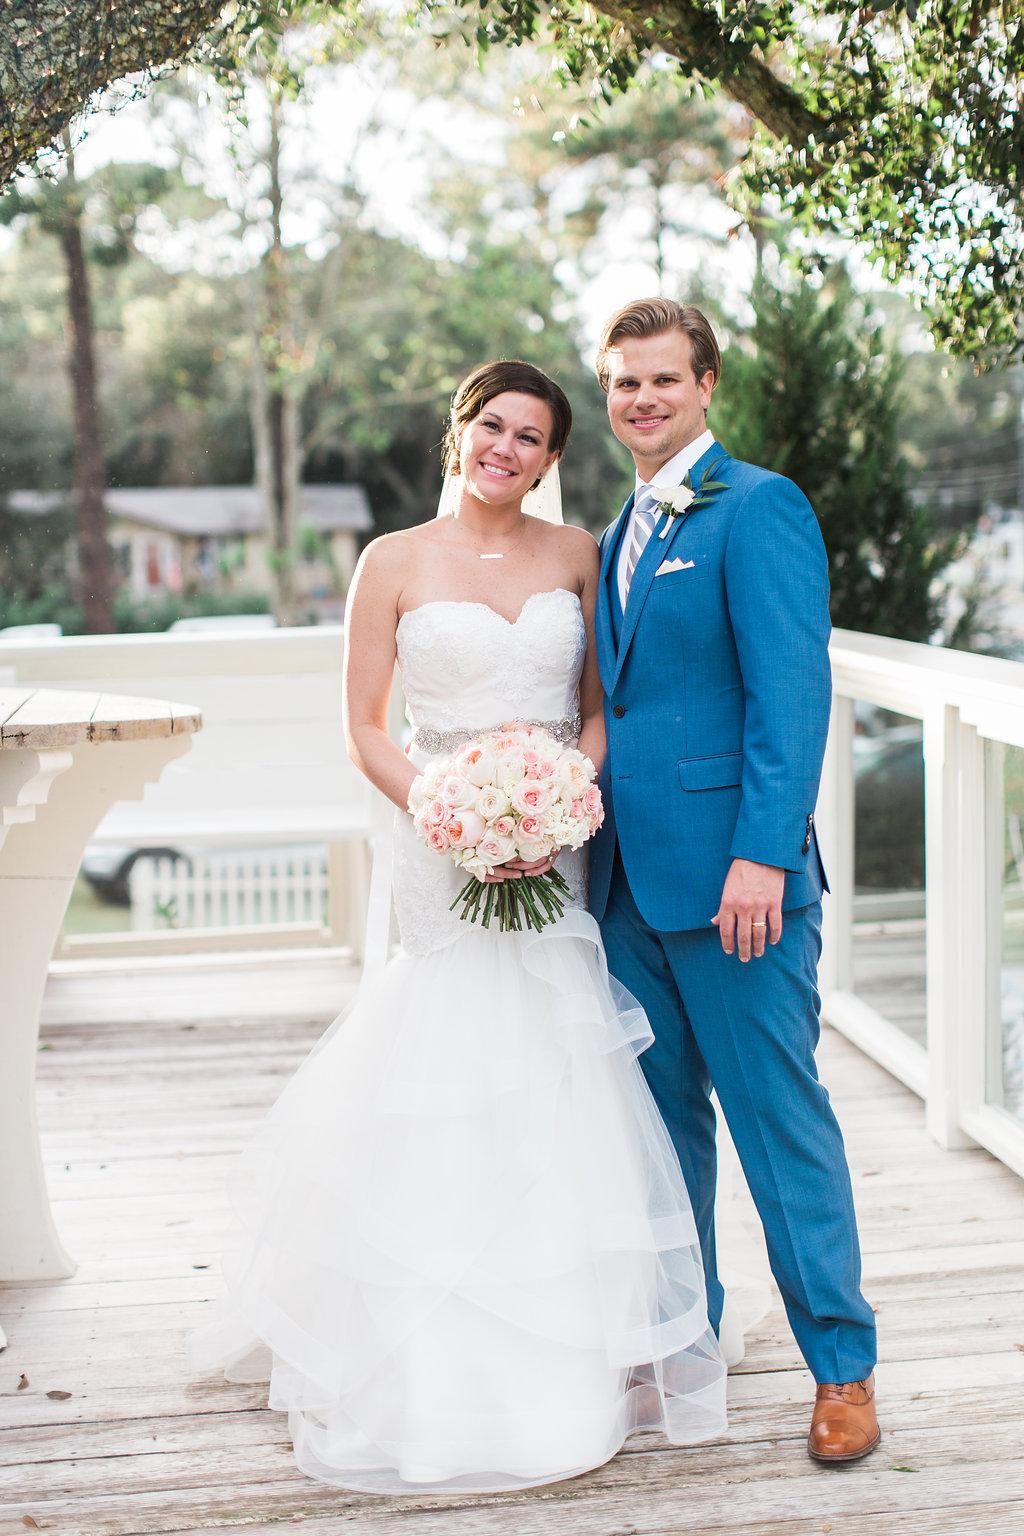 apt-b-photography-ivory-and-beau-bridal-boutique-savannah-florist-savannah-wedding-flowers-savannah-wedding-planner-tybee-island-wedding-chapel-wedding-rose-bouquet-blush-wedding-tybee-wedding-savannah-weddings-savannah-flowers-17.jpg